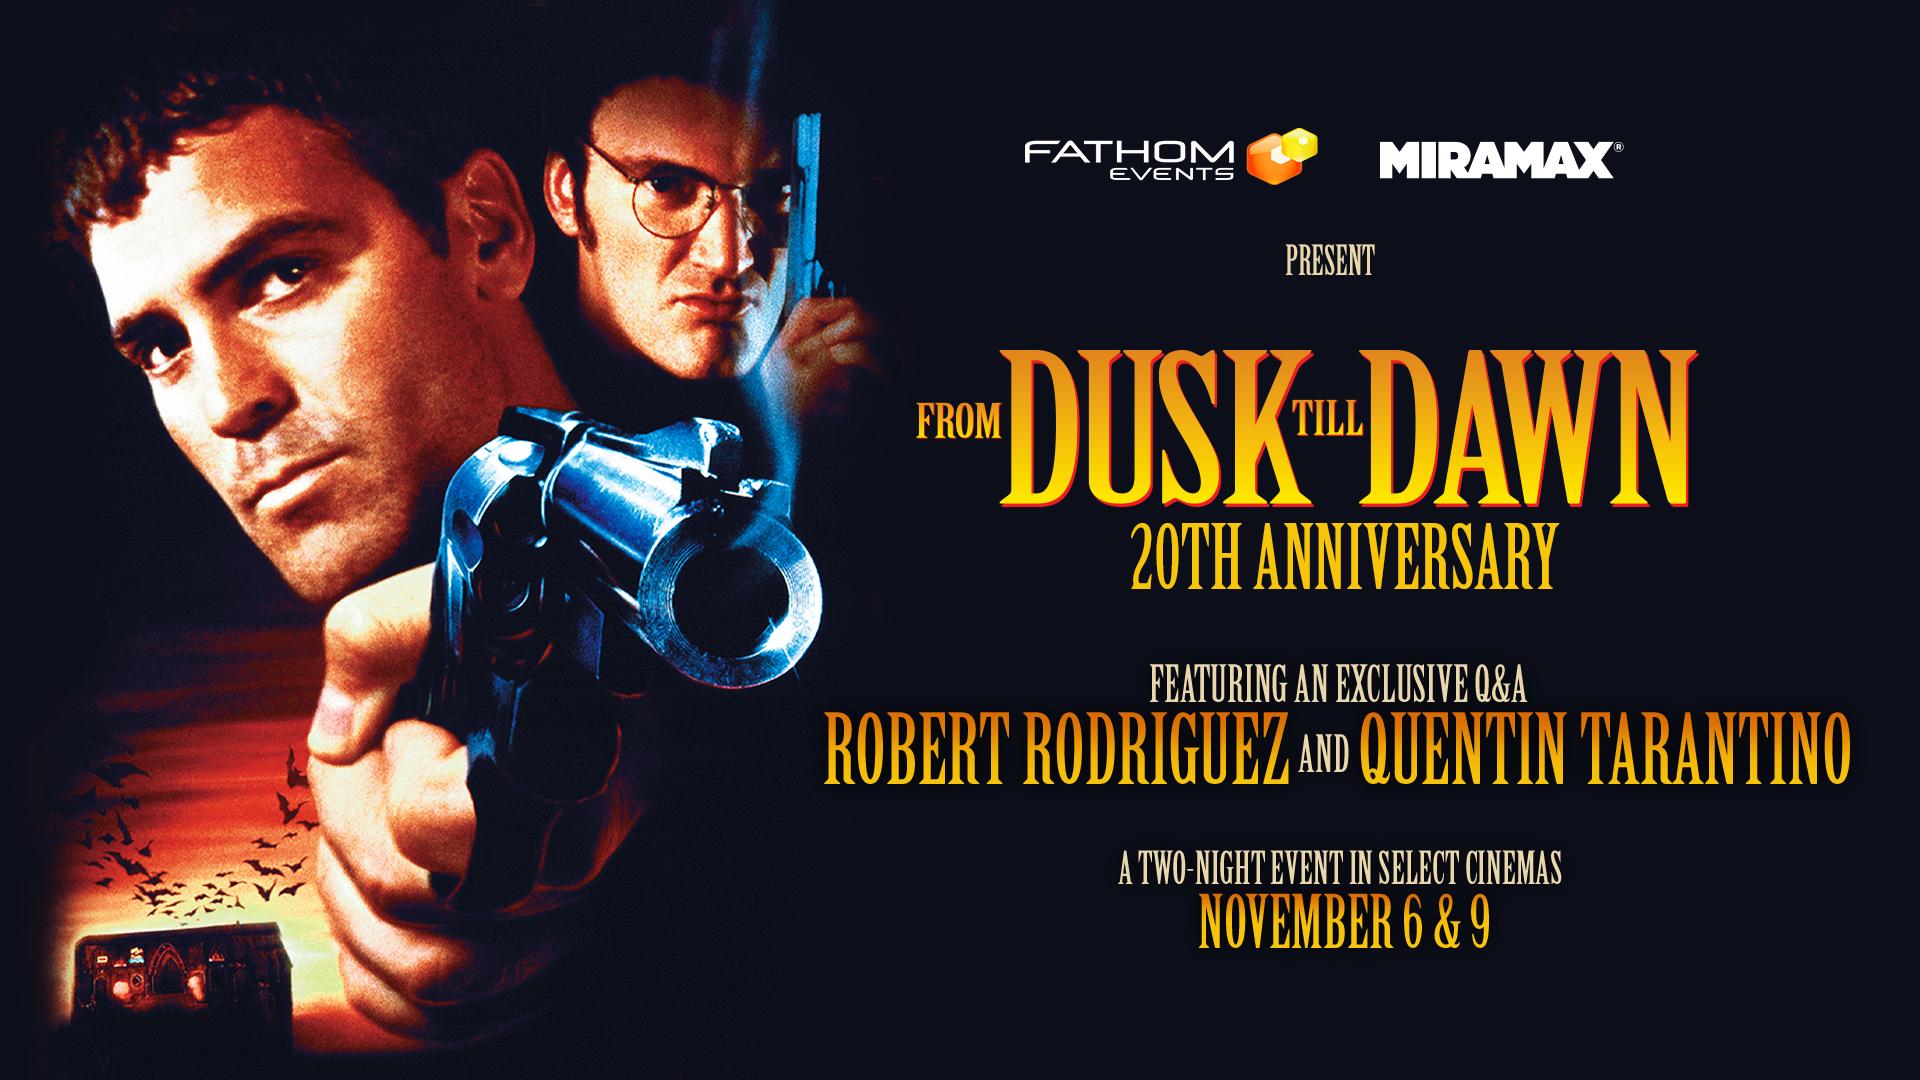 From Dusk Till Dawn 20th Anniversary - Fathom Events Trailer